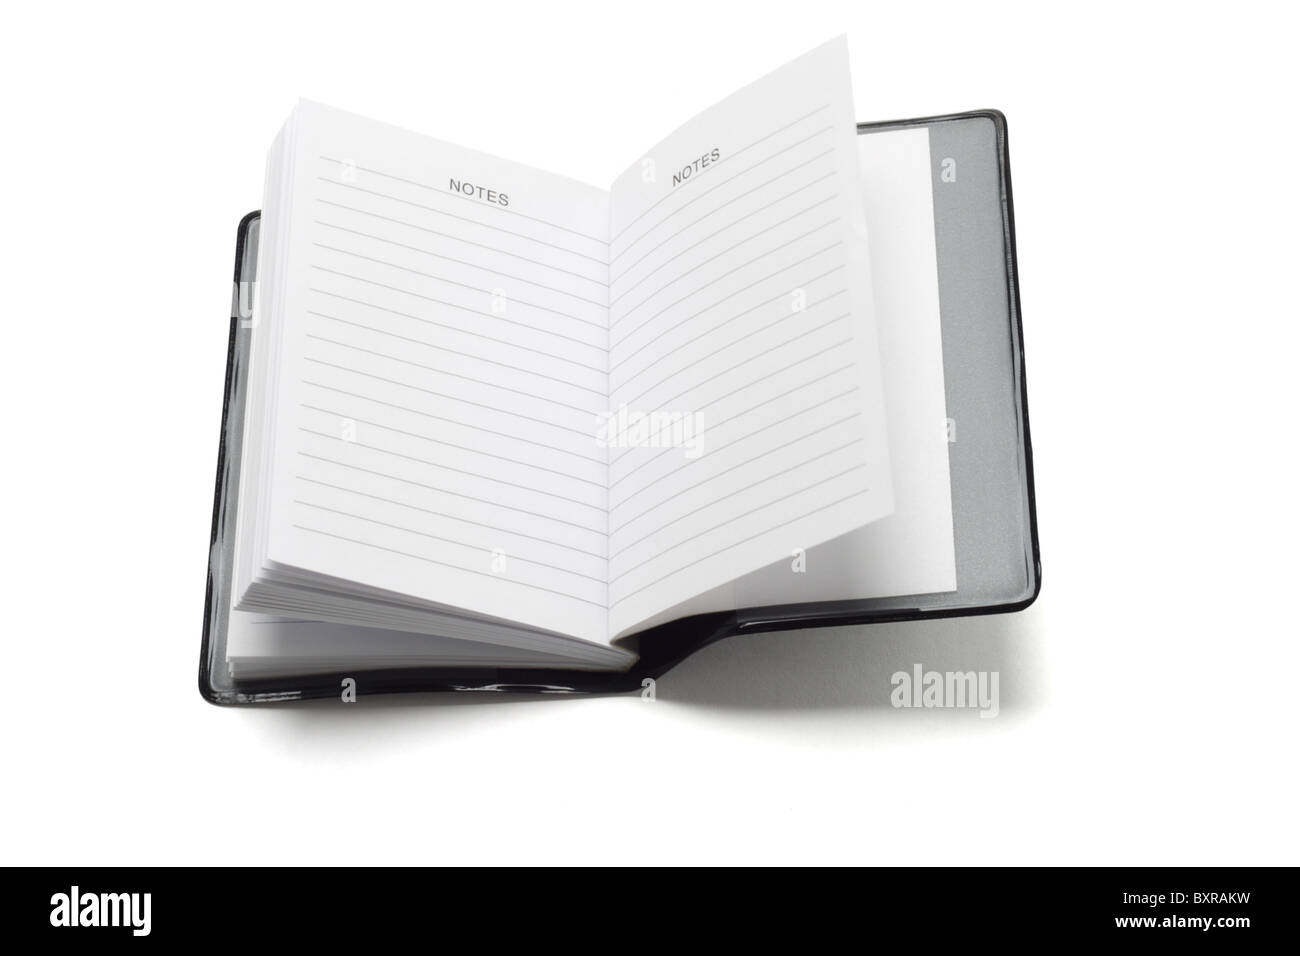 Note pocket mini livre sur fond blanc Photo Stock